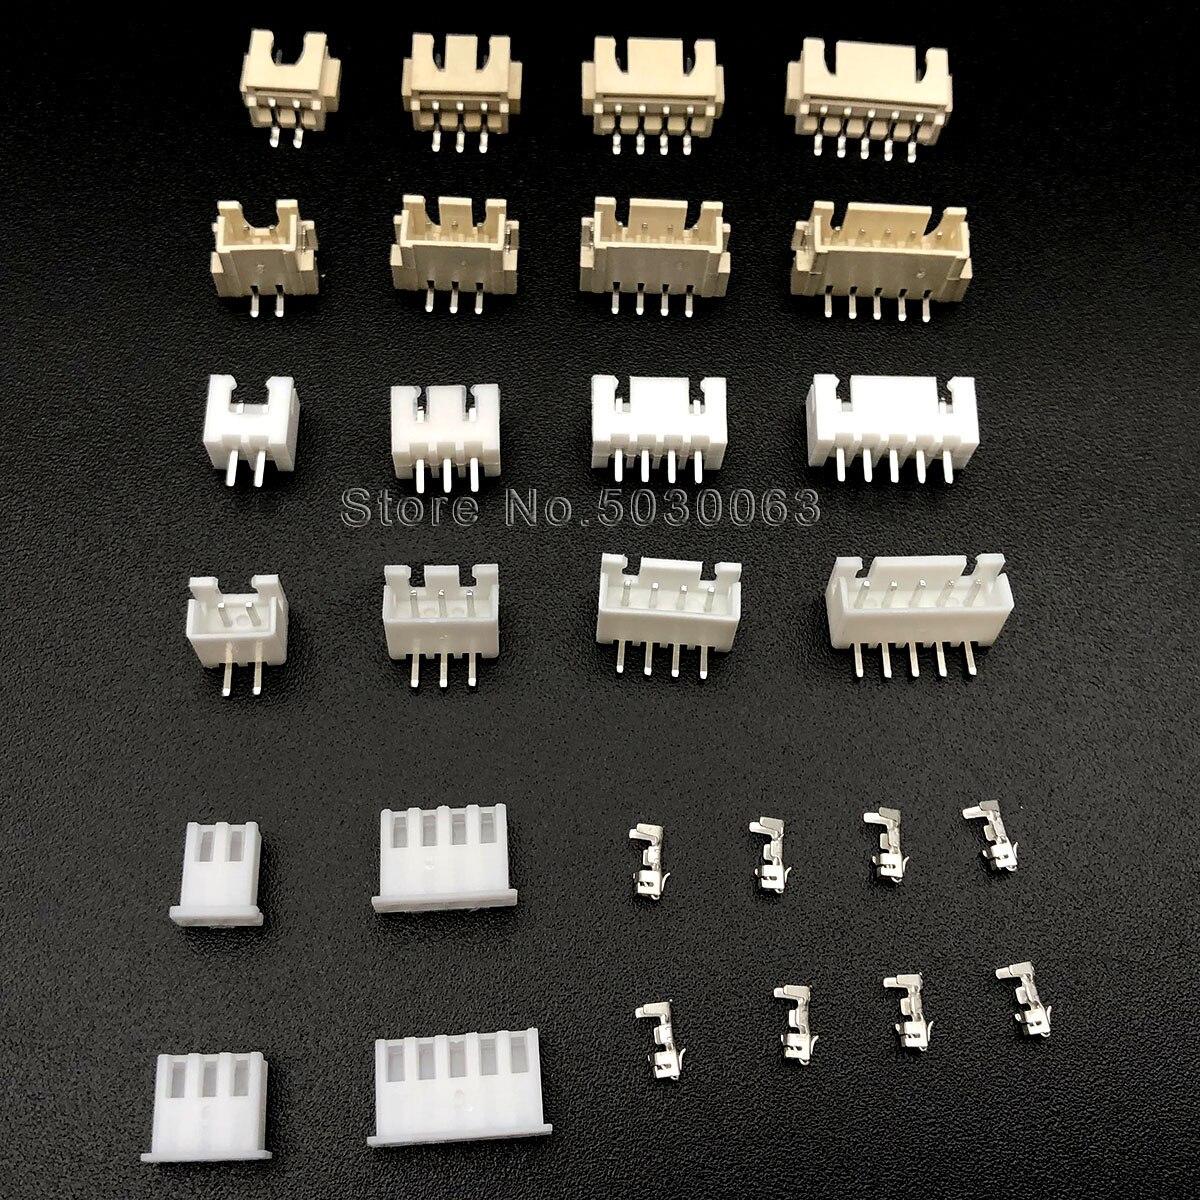 2Pin ~ 12Pin Bent//Straight Pin Shell Vertical Horizontal SMD Socket 1.25mm Pitch